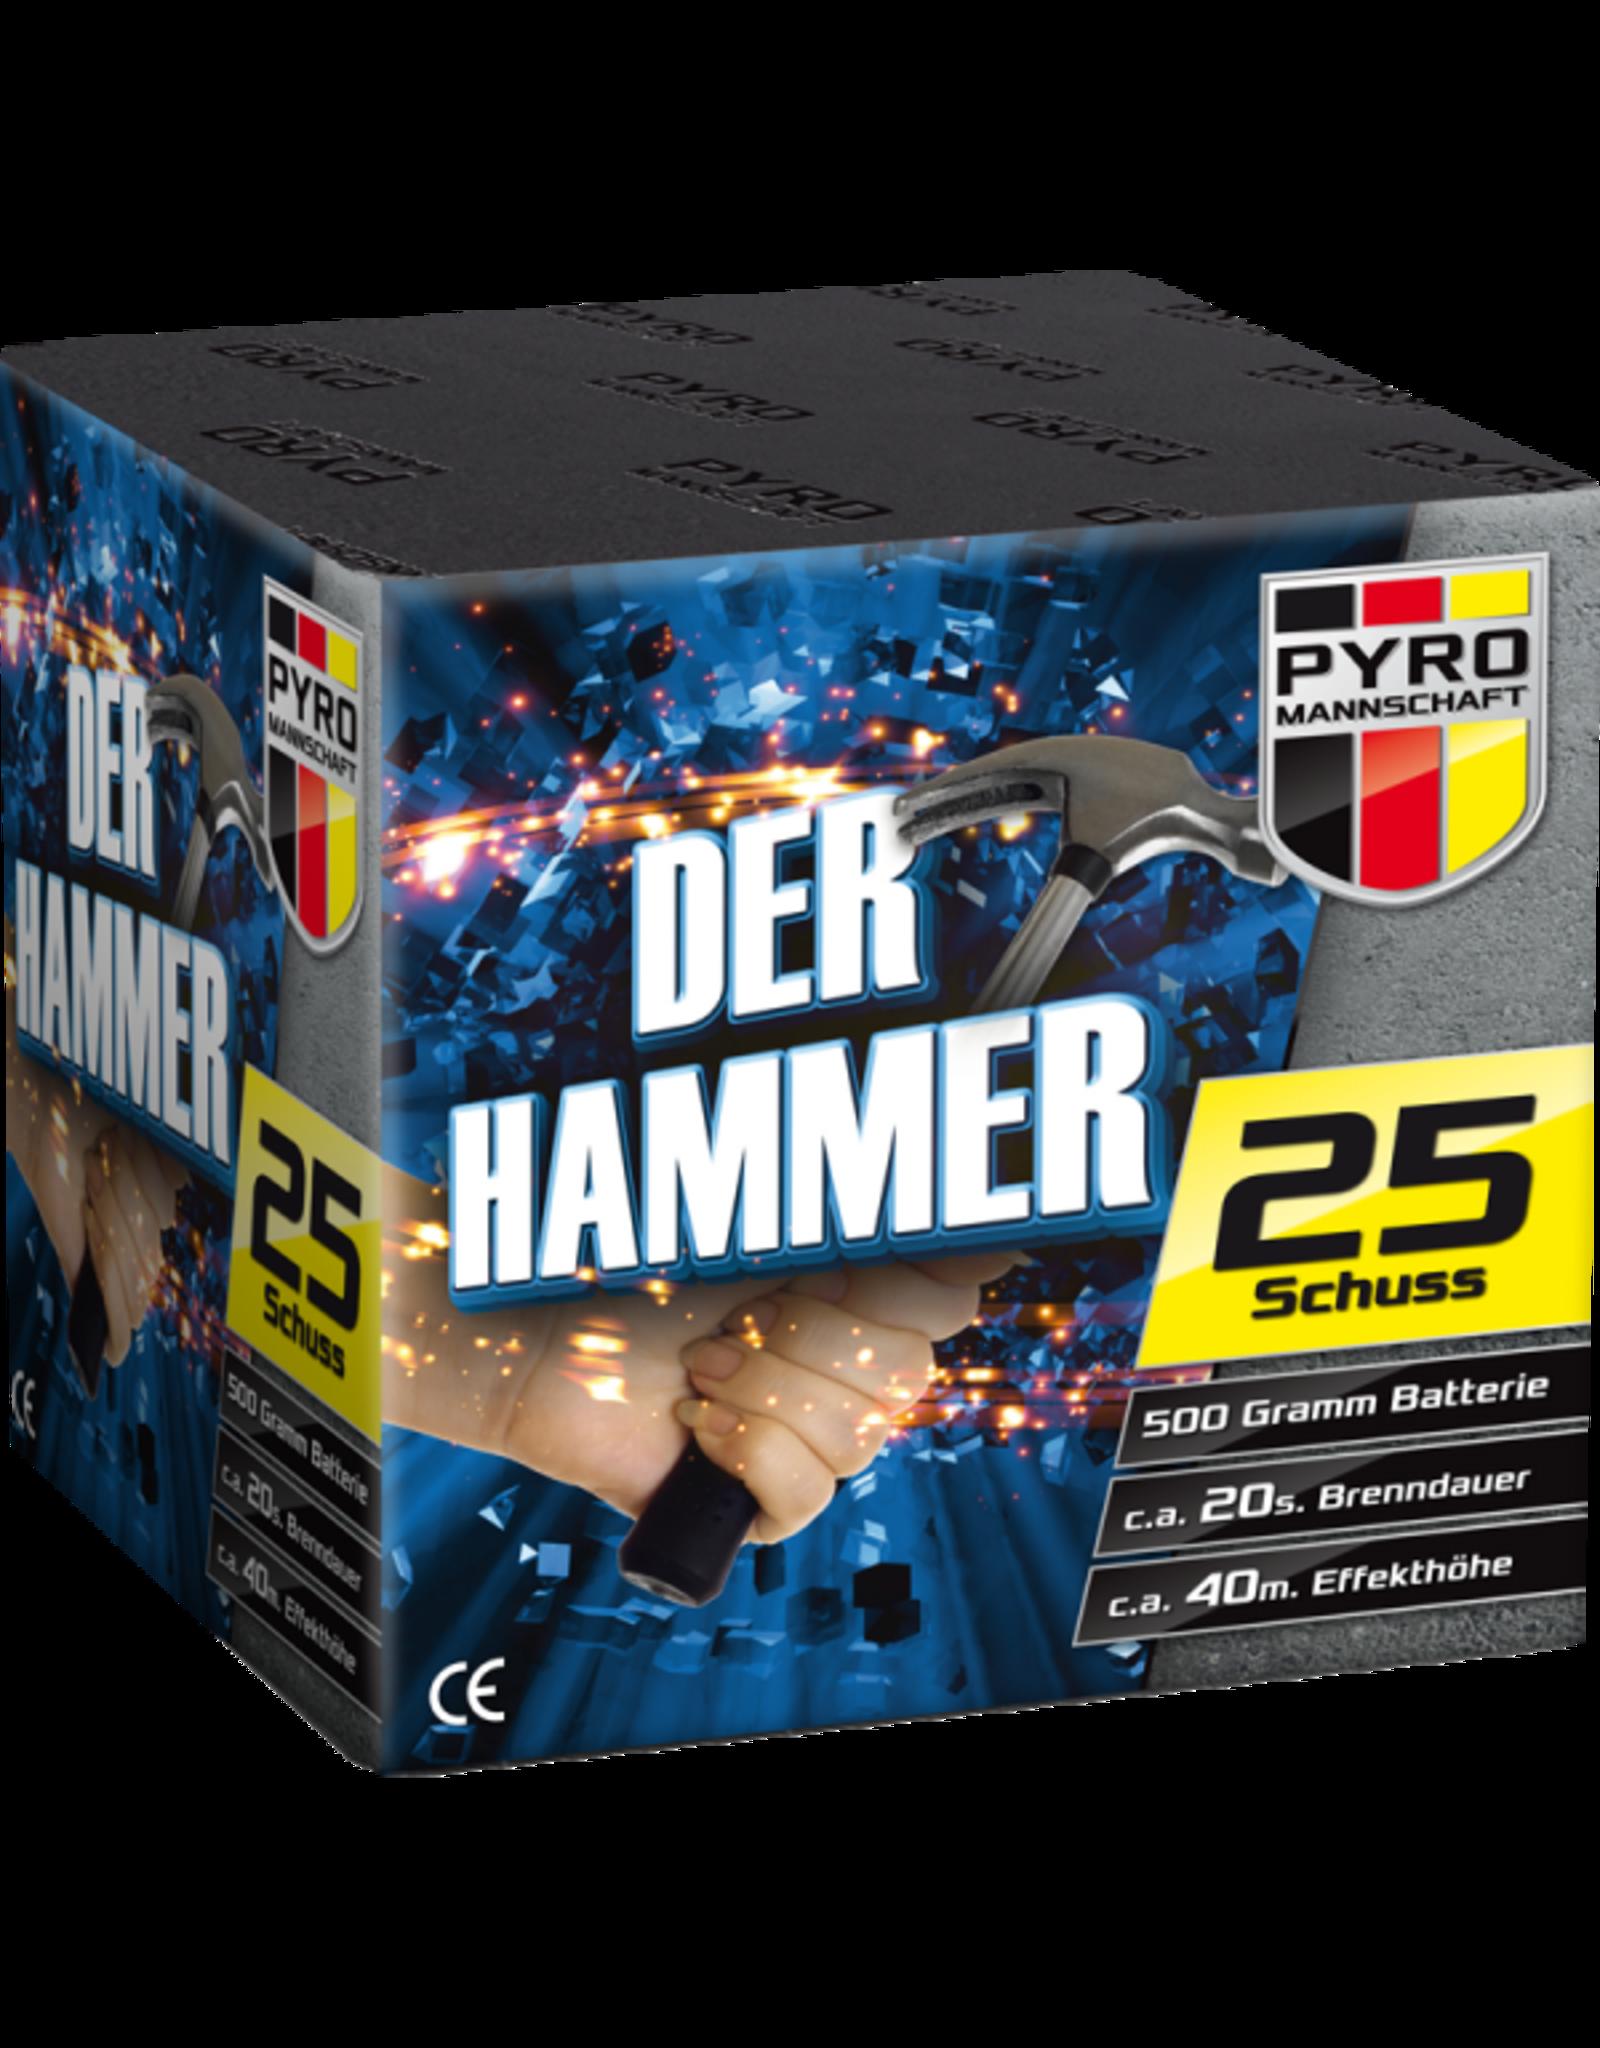 Vuurwerktotaal Der Hammer 25 shots